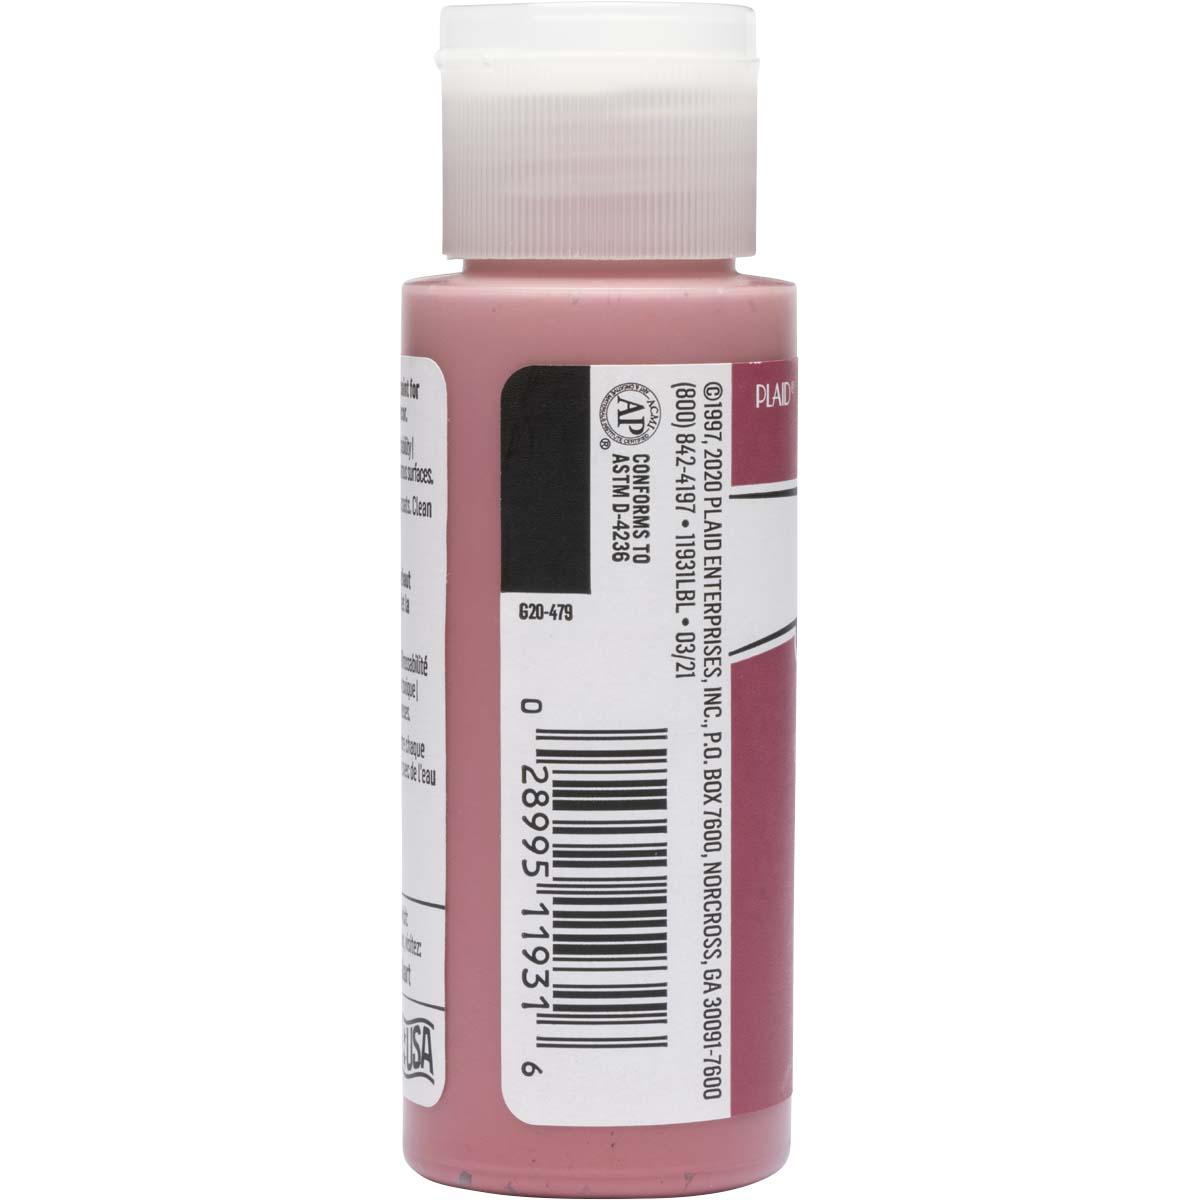 FolkArt ® Acrylic Colors - Wild Rose, 2 oz. - 11931